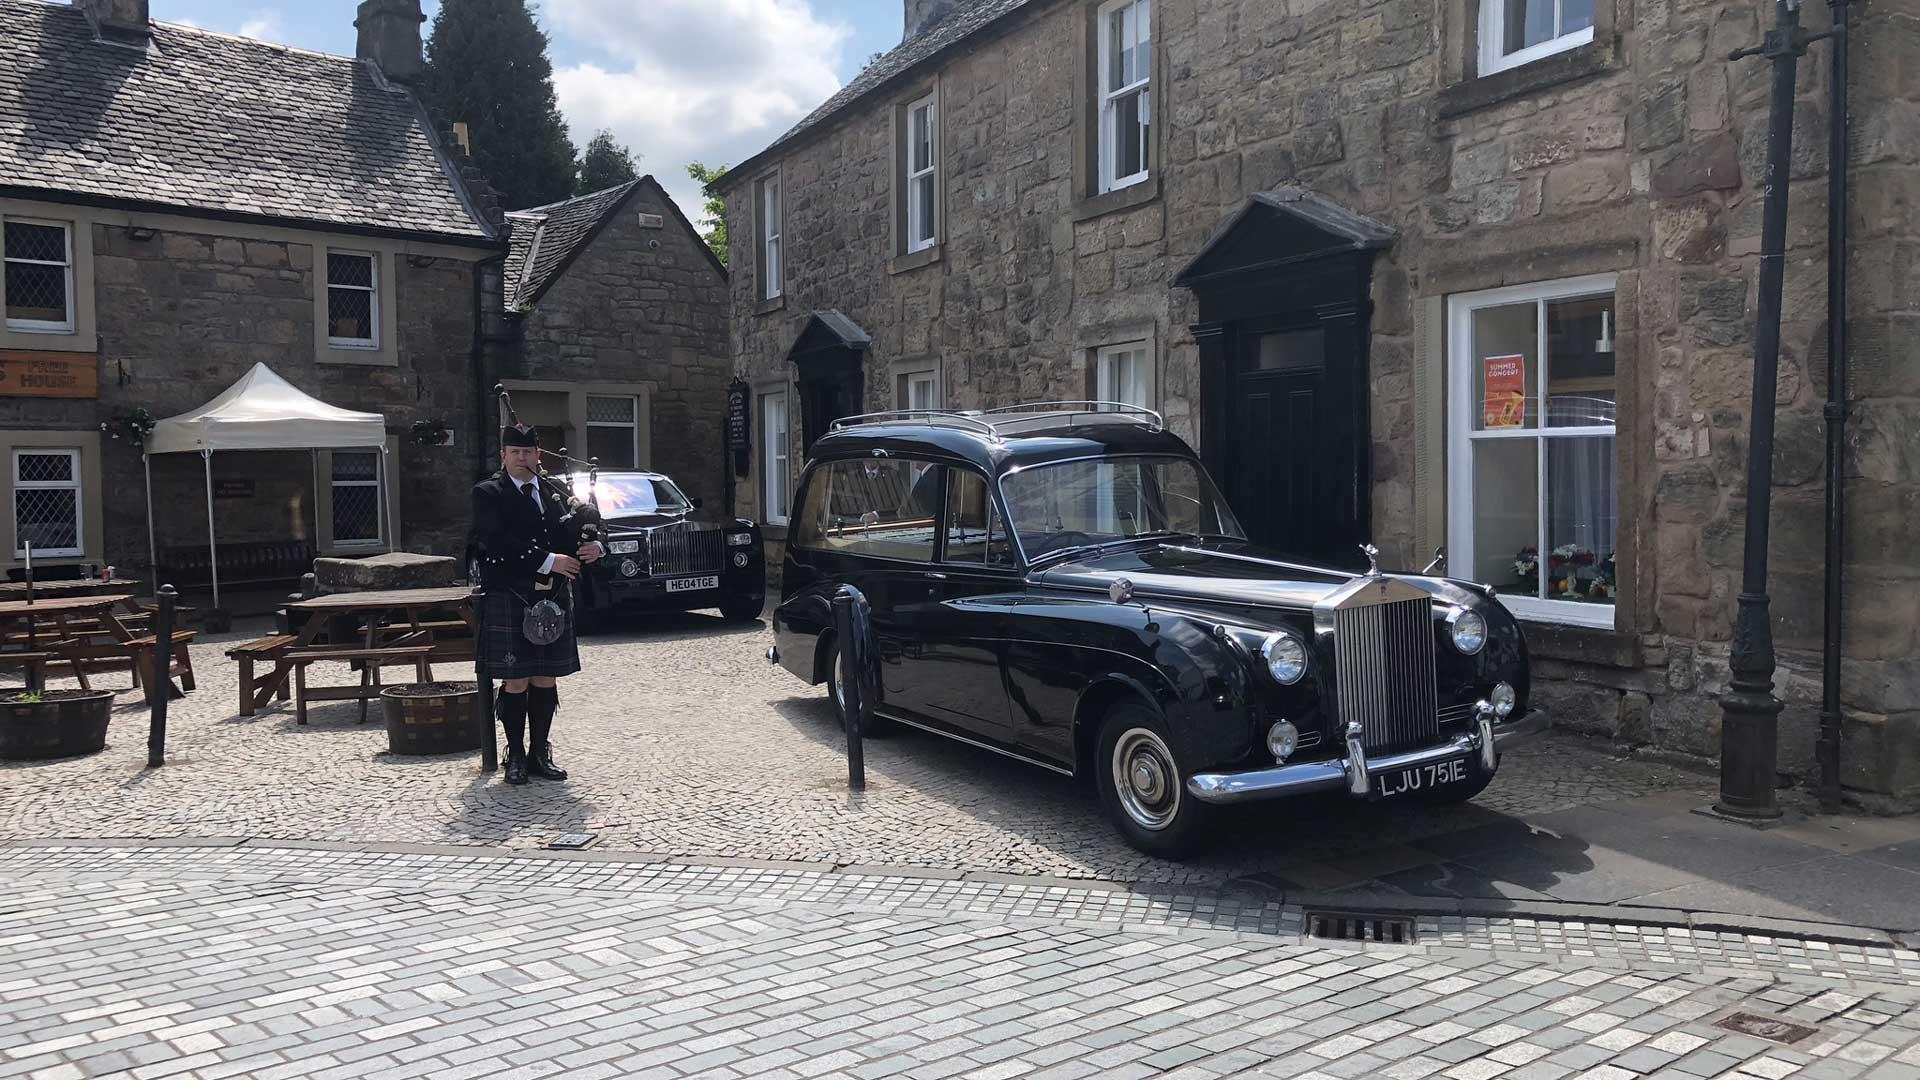 East Kilbride Funeral